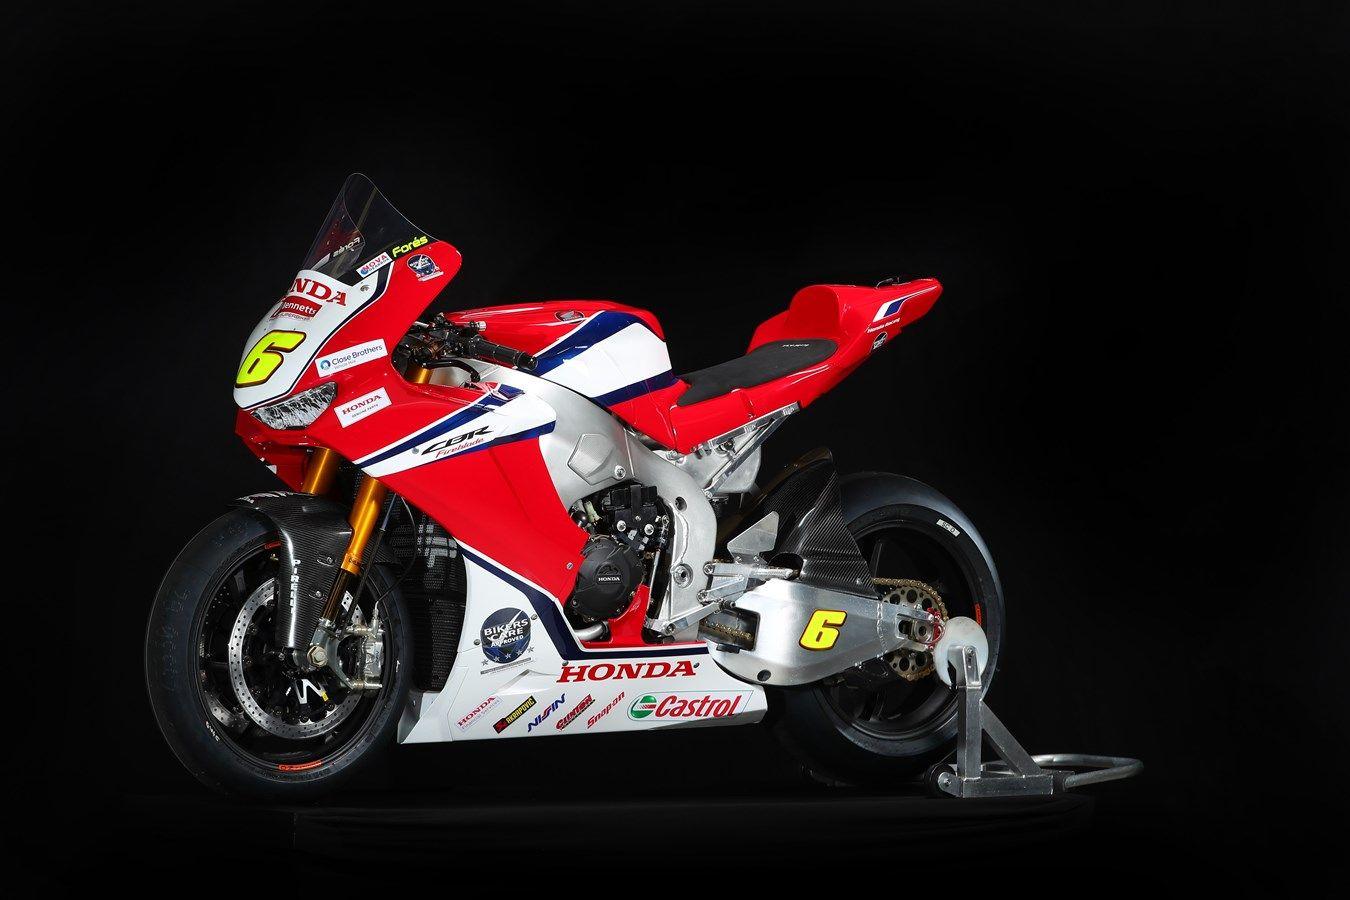 Bikers Care Approved On Board With Honda For The 2019 British Superbike Season 2019bennettsbritishsuperbikechampionship Andrewirwin Honda British Biker